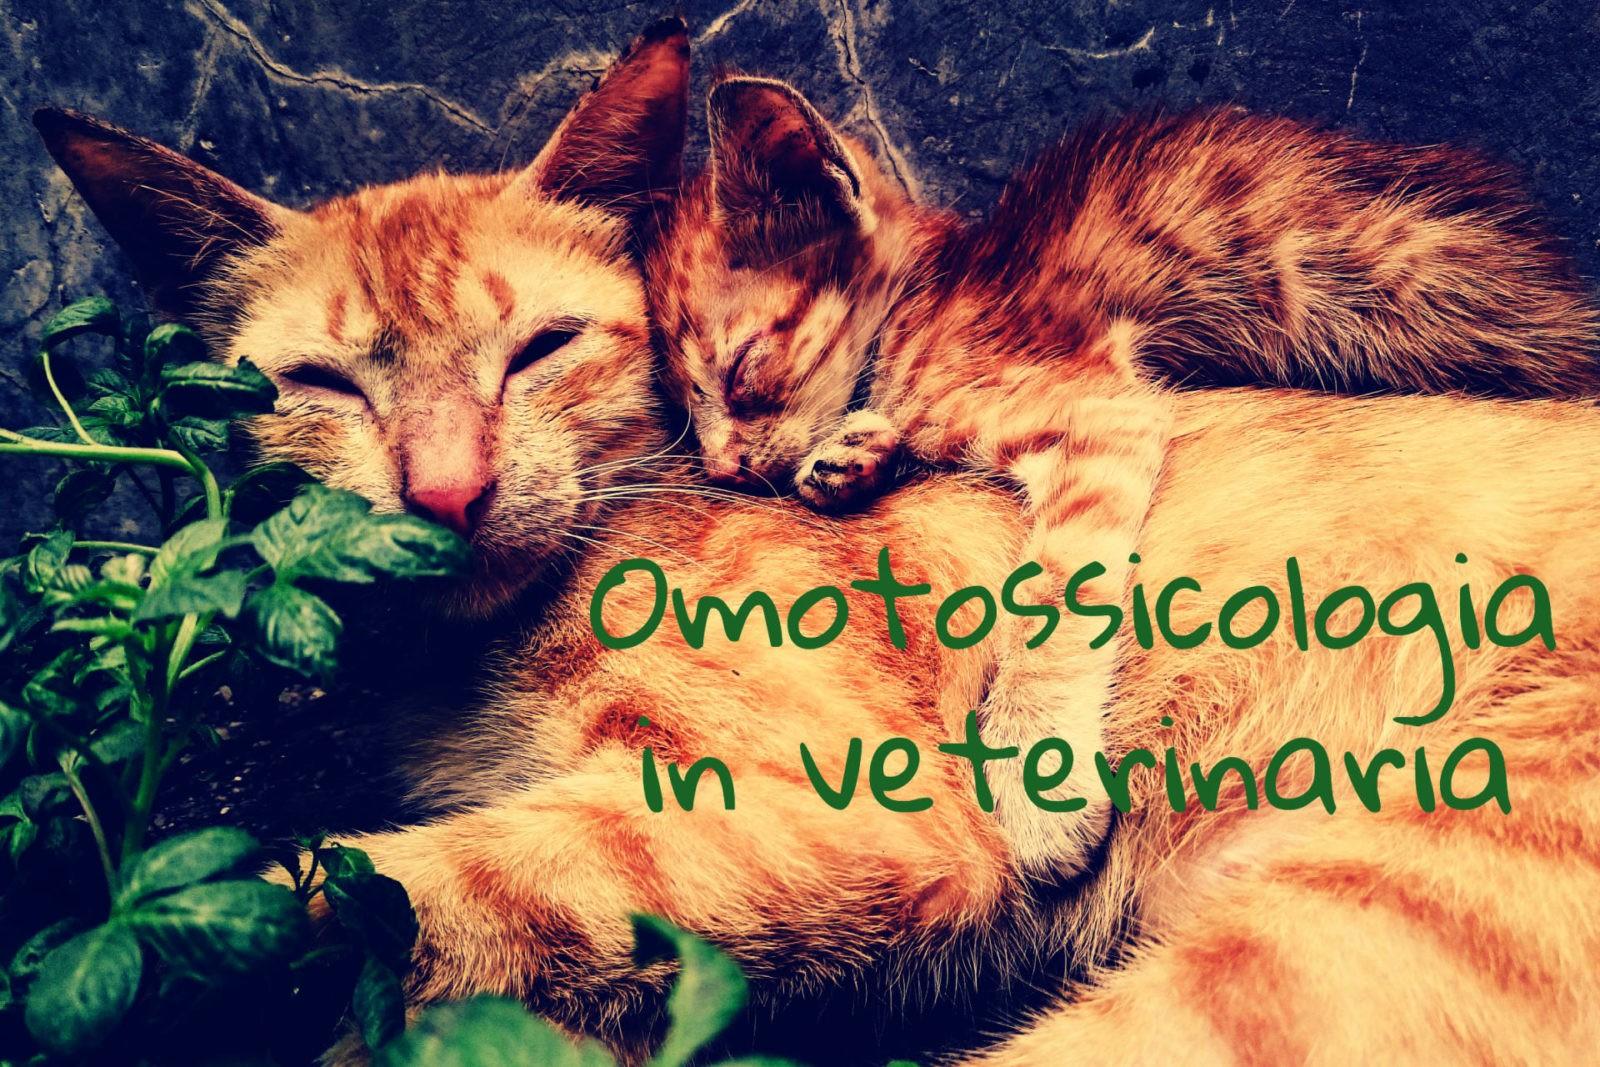 Omotossicologia veterinaria